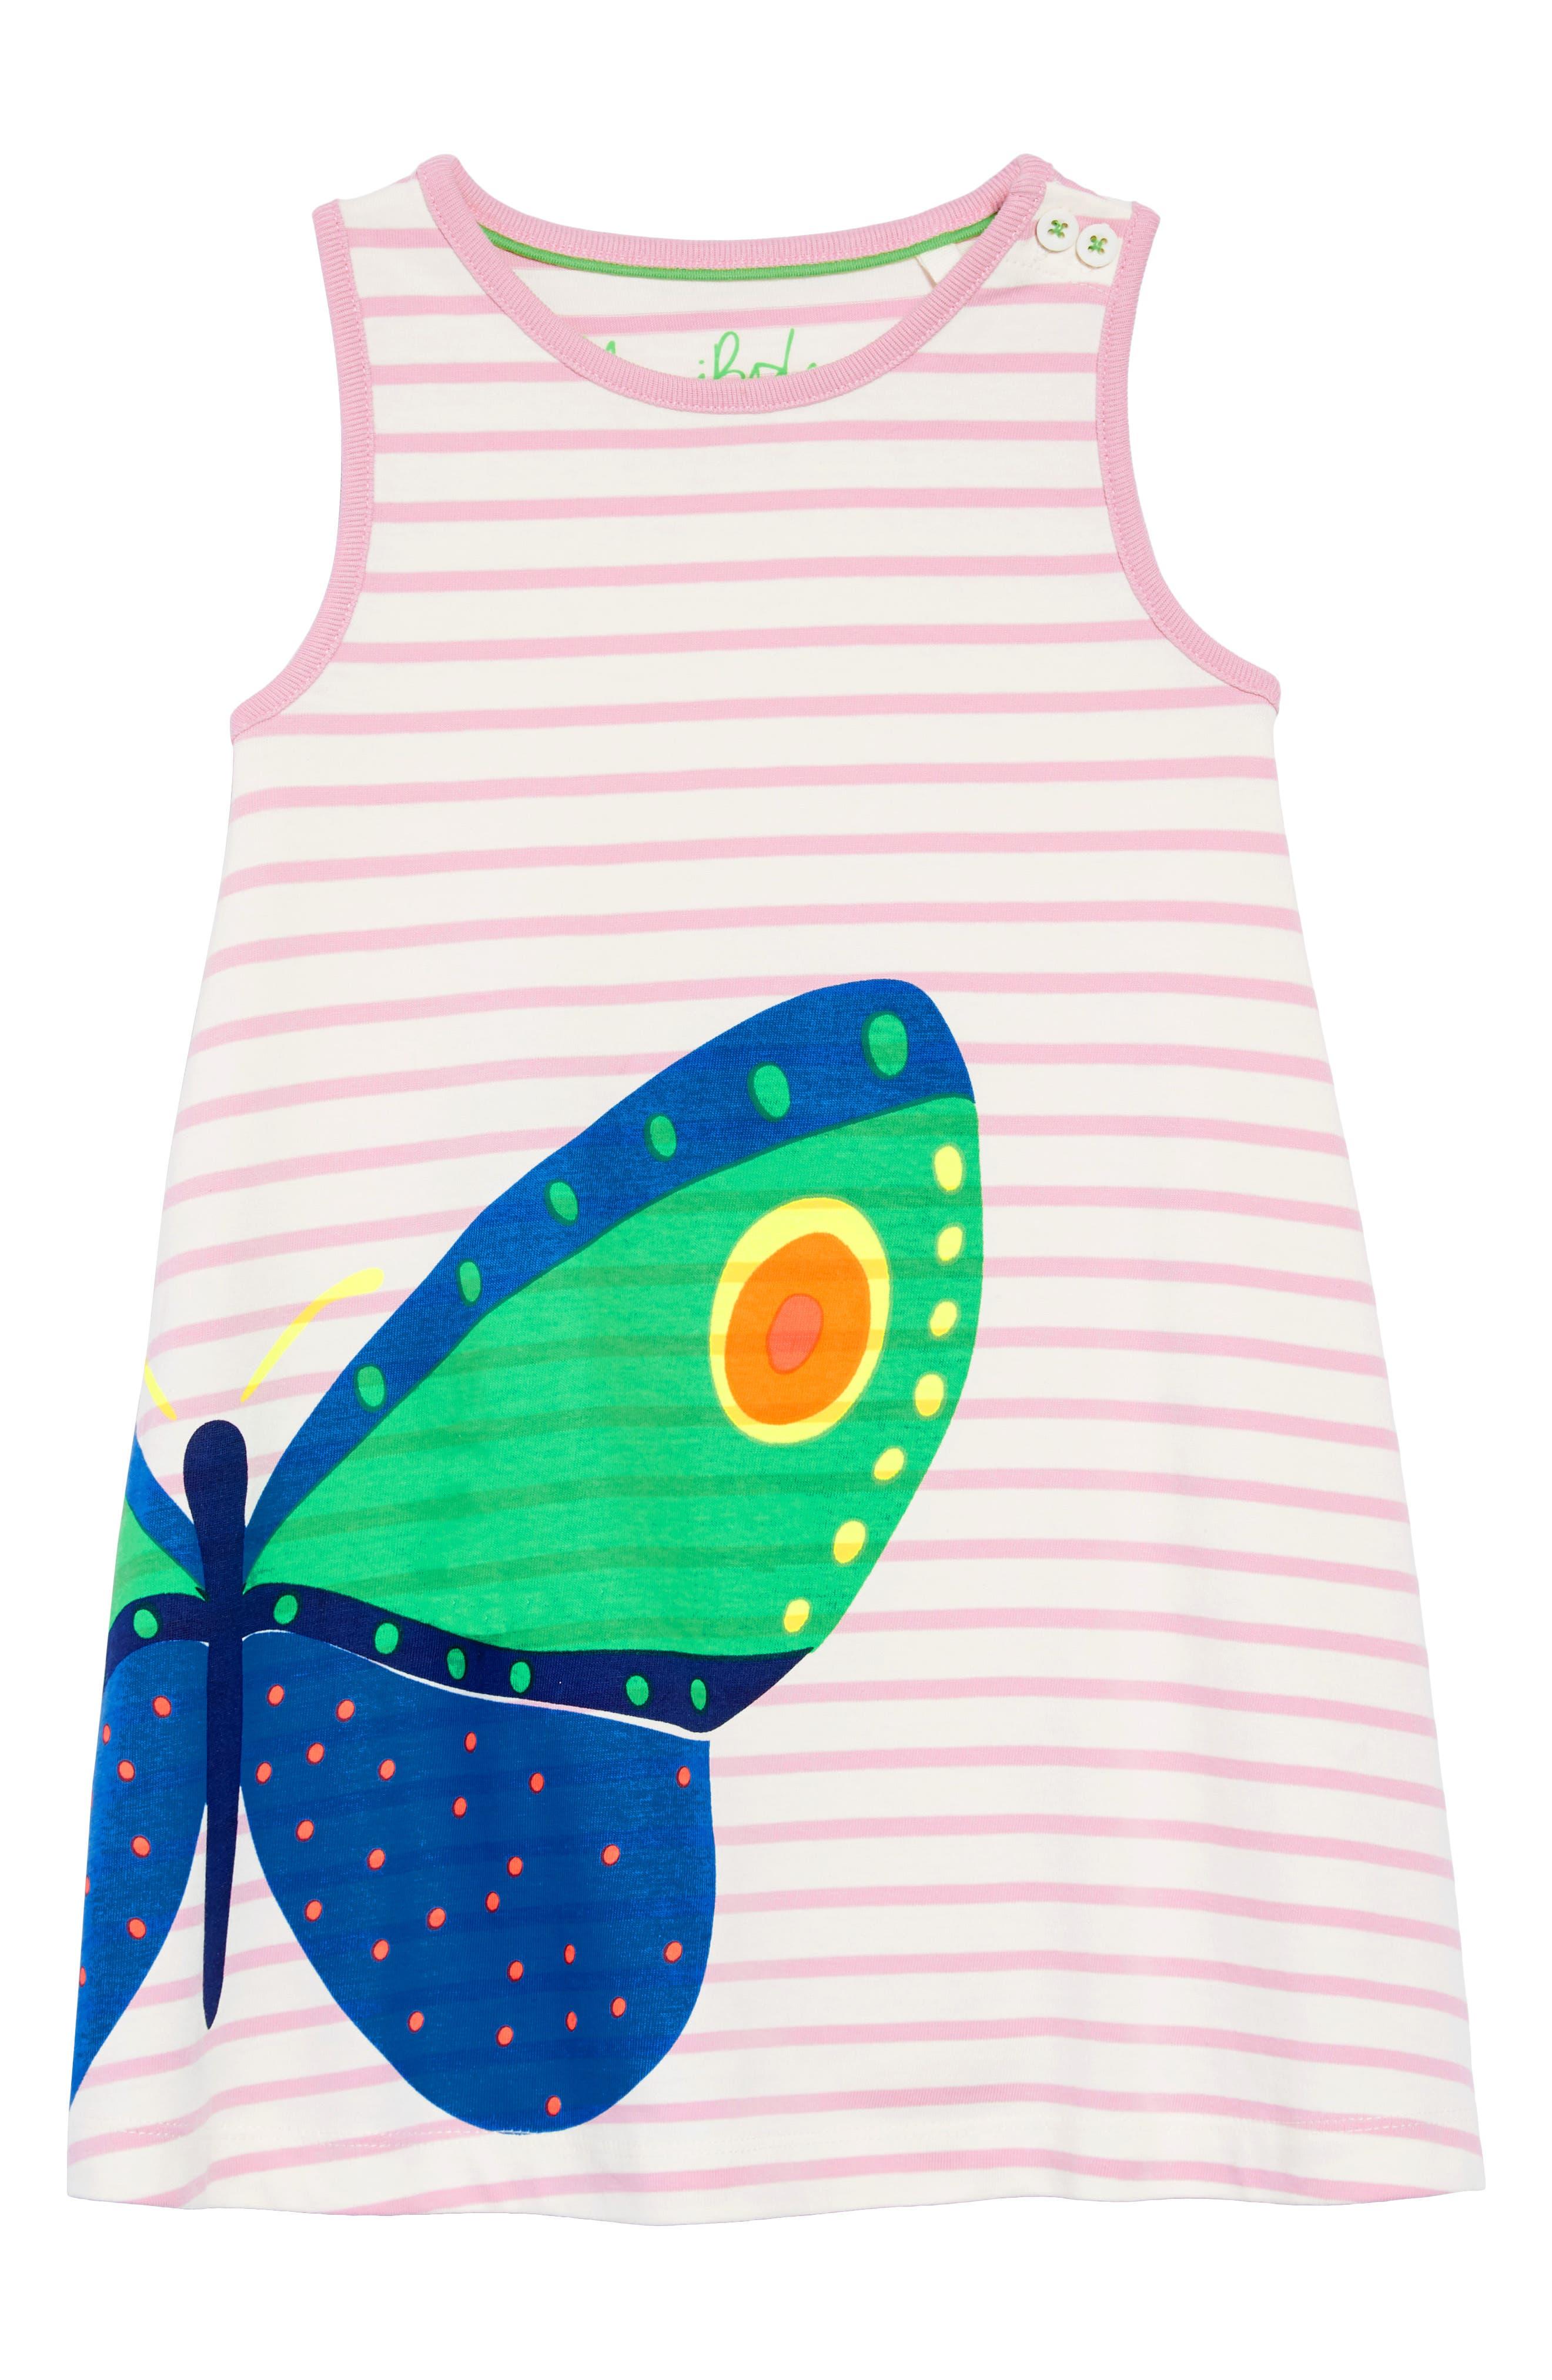 Vacation Appliqué Dress,                             Main thumbnail 1, color,                             Ivory/ Rosebud Stripe